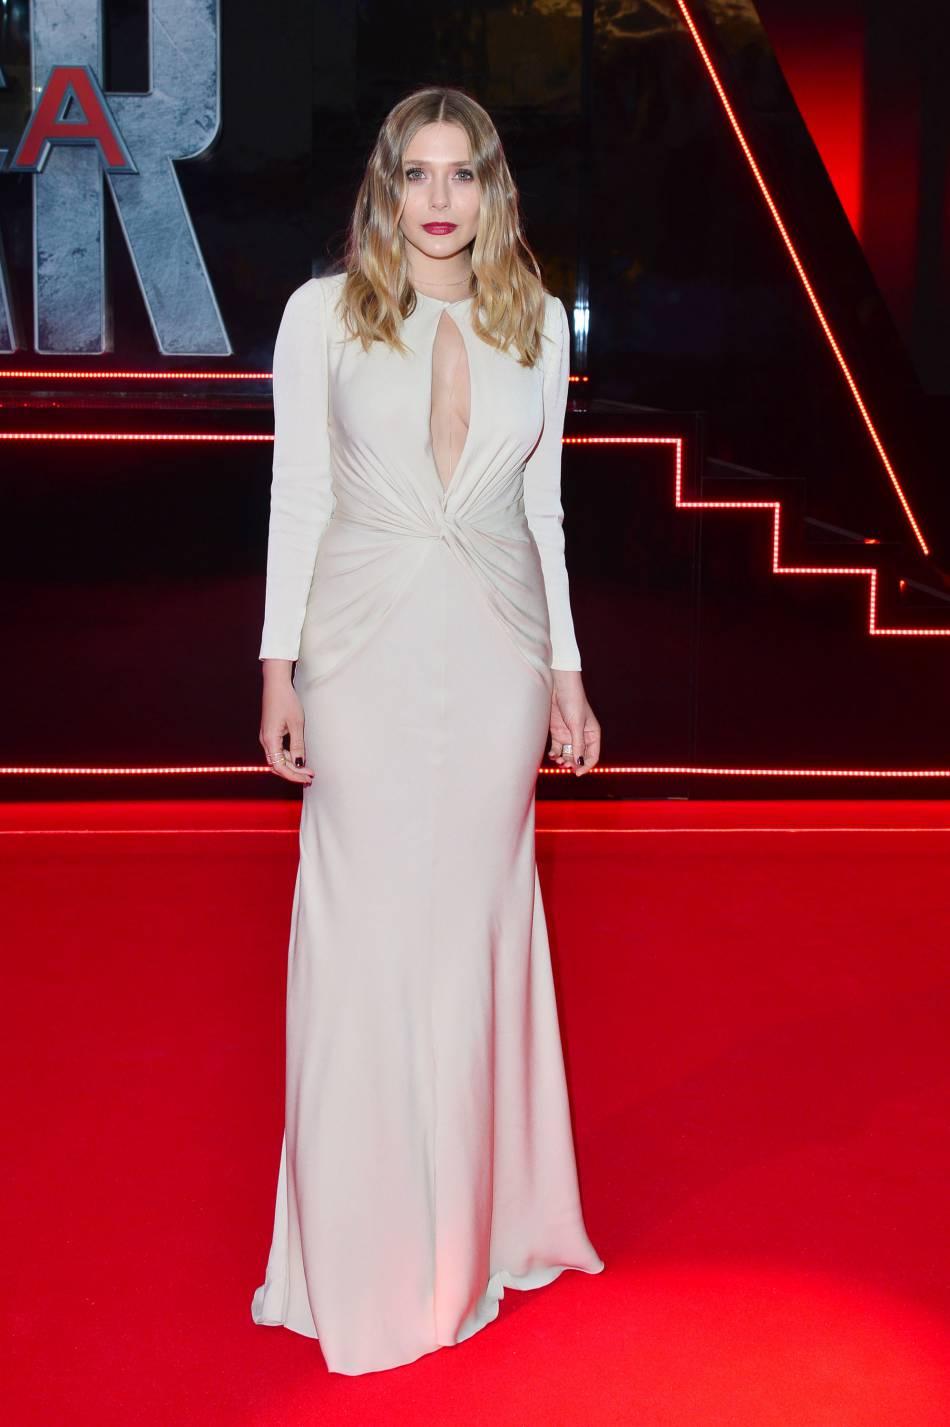 En robe Alexander McQueen, l'actrice Elizabeth Olsen joue la carte du glamour.